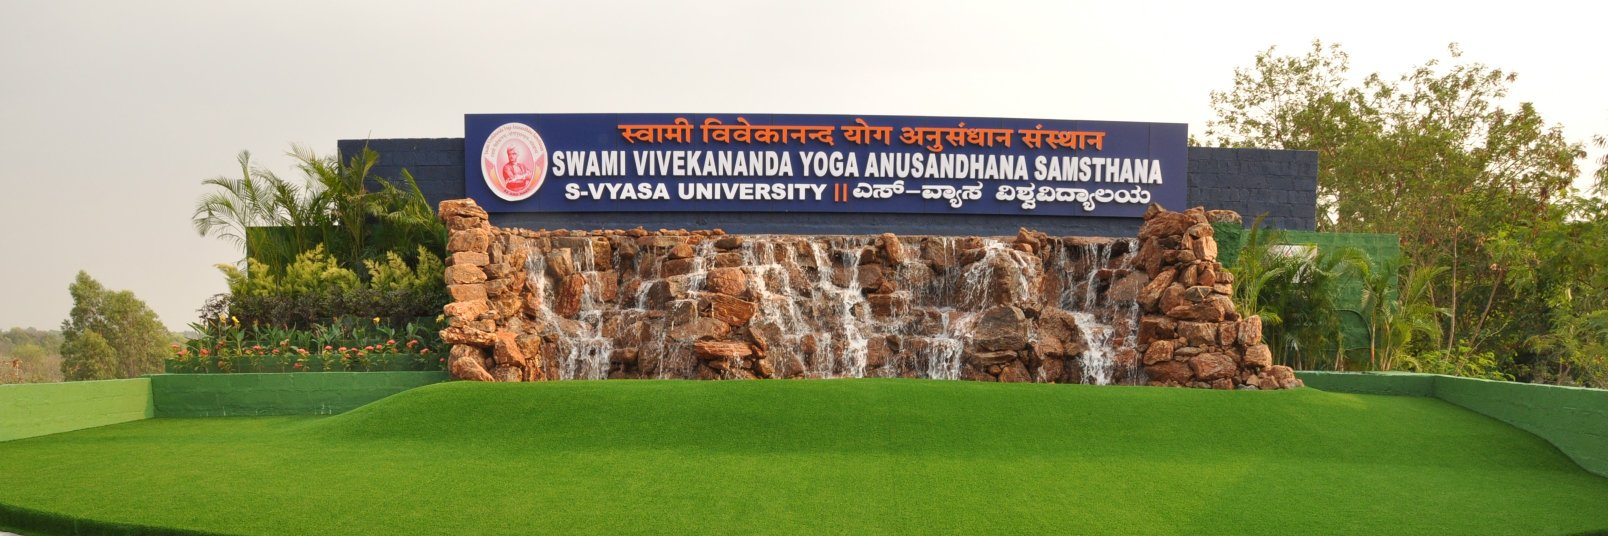 Swami Vivekananda Yoga Anusandhana Samsthana's official Twitter account